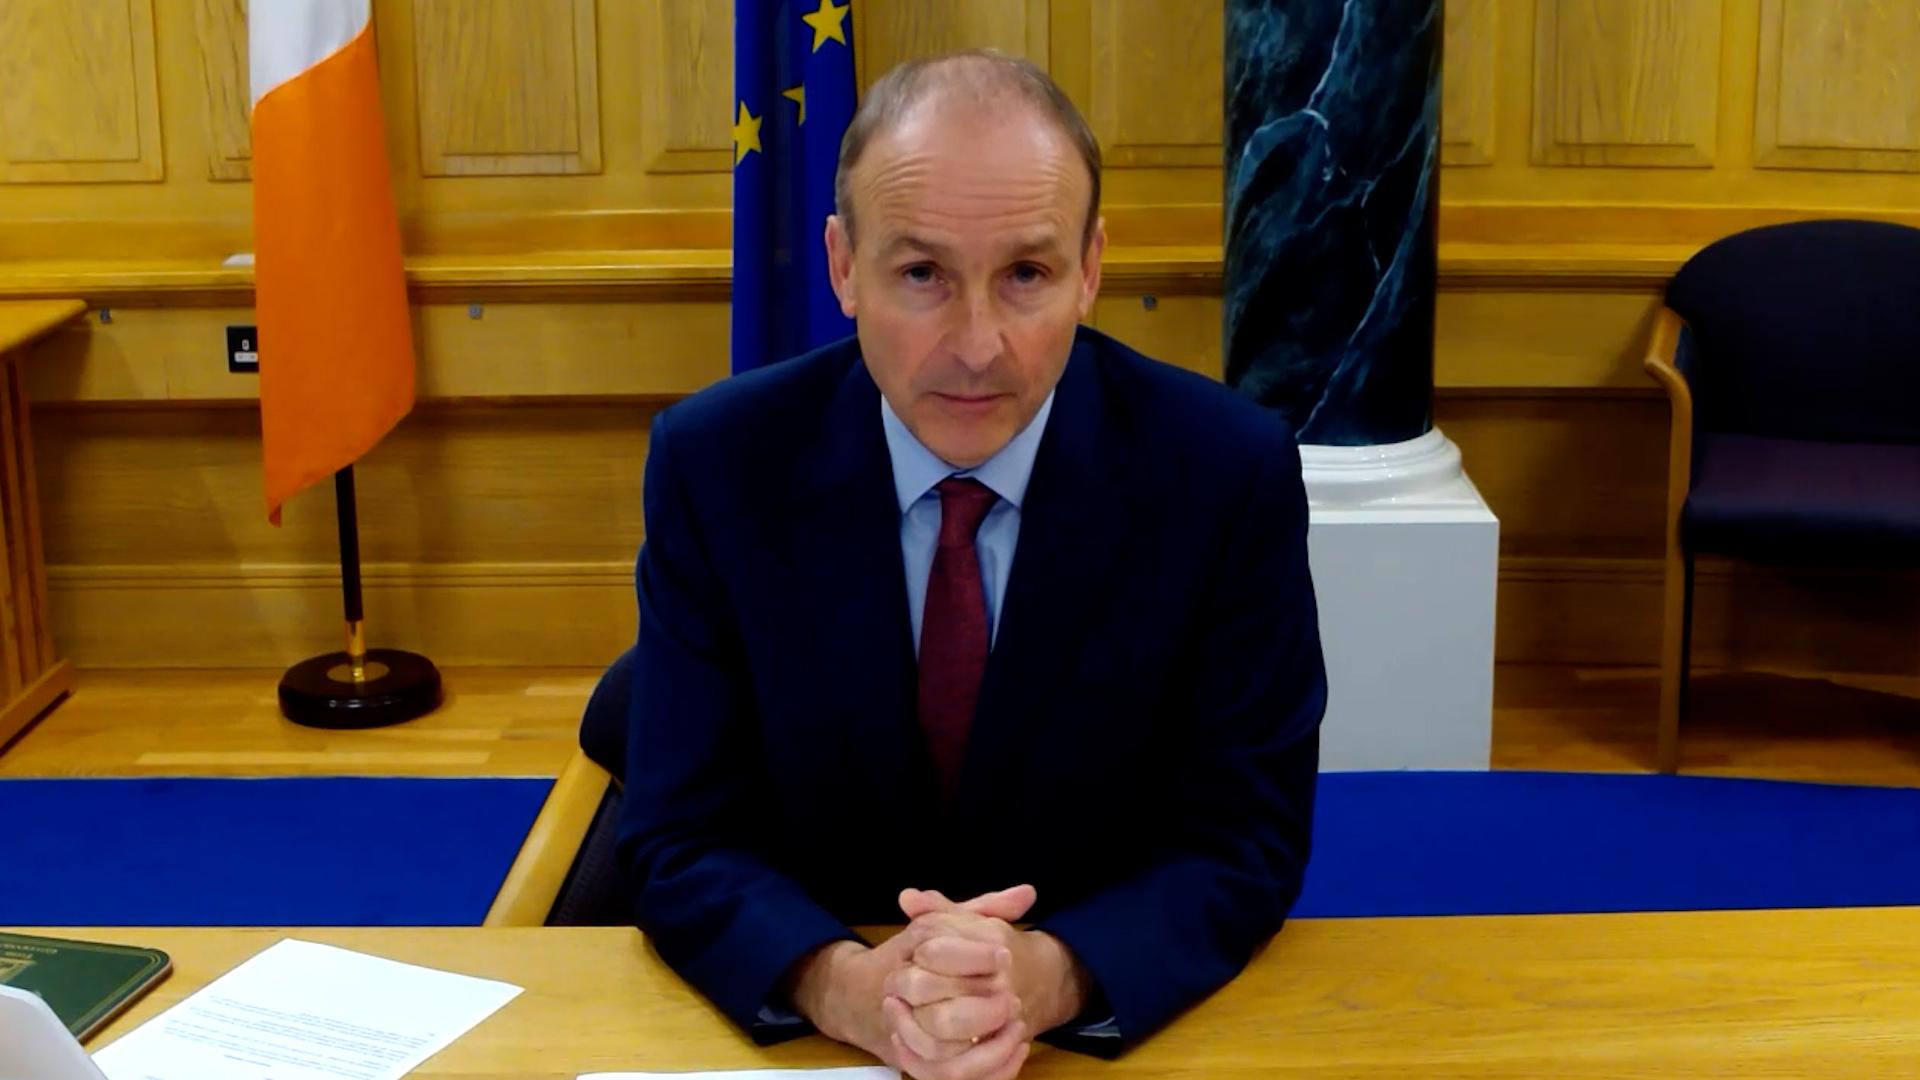 Taoiseach Micheál Martin speaks to Newstalk Breakfast from his office in Dublin city.